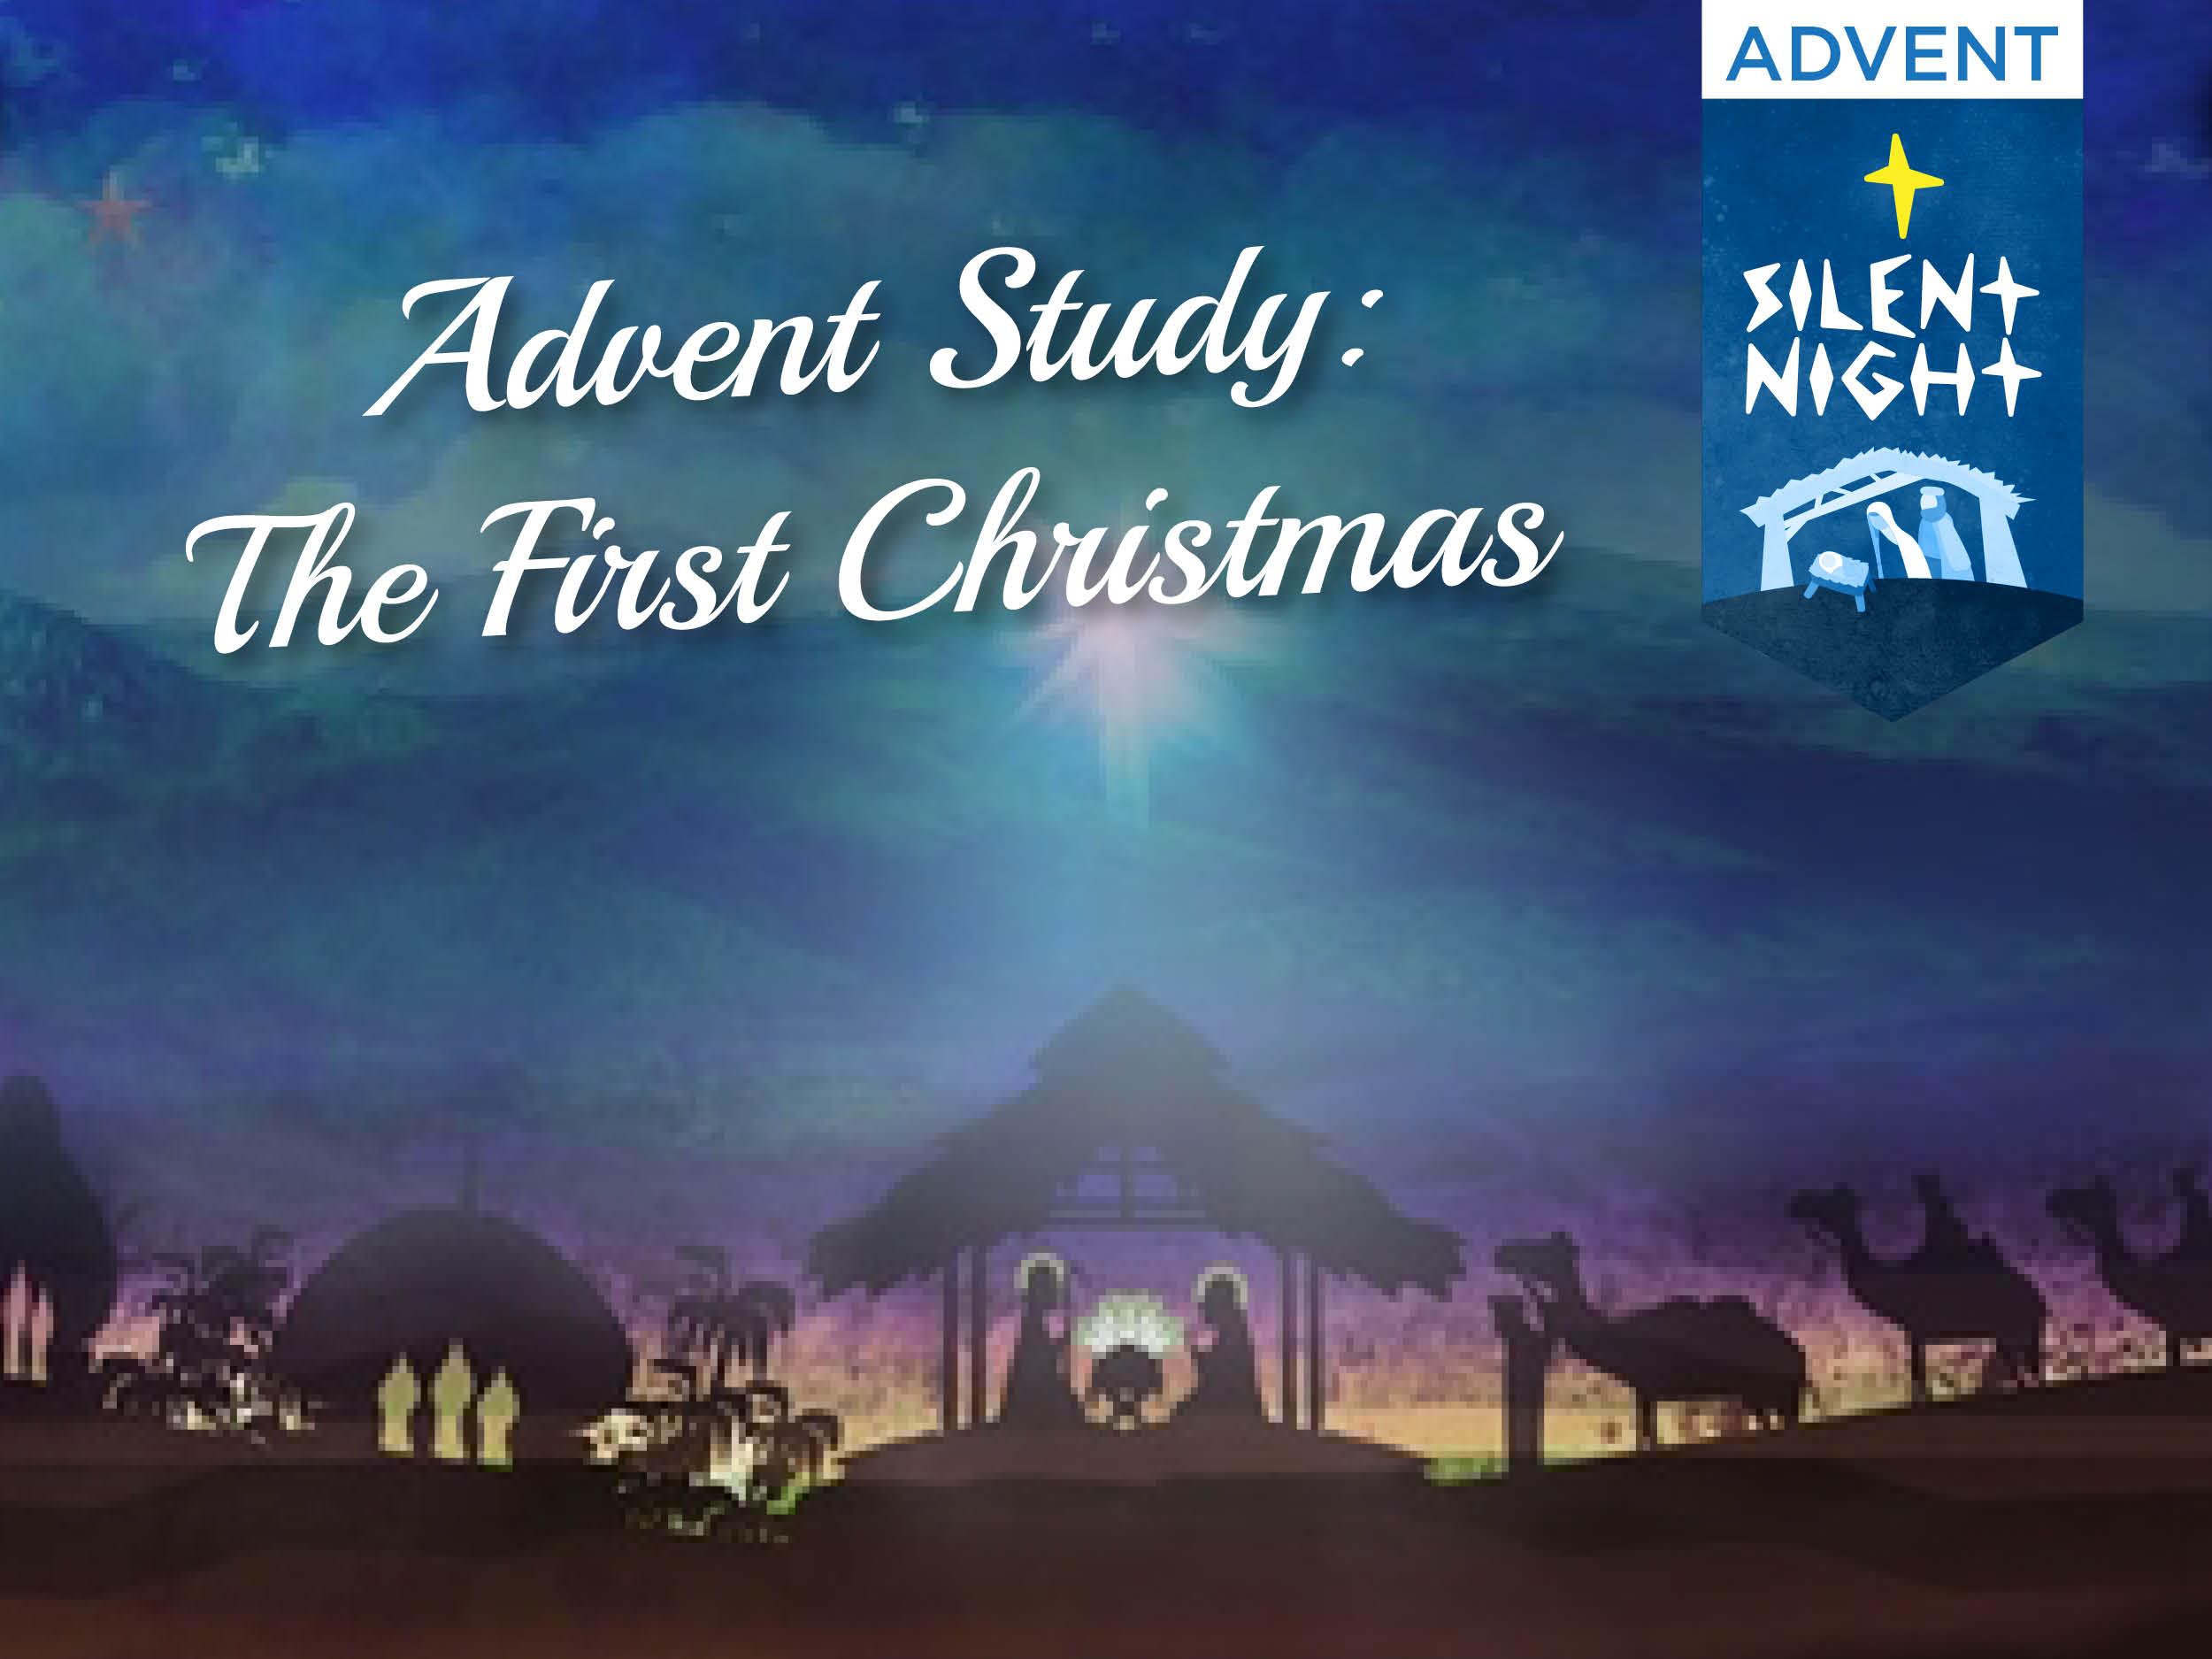 sunday november 18 930 am 1040 am - Church Of The Highlands Christmas